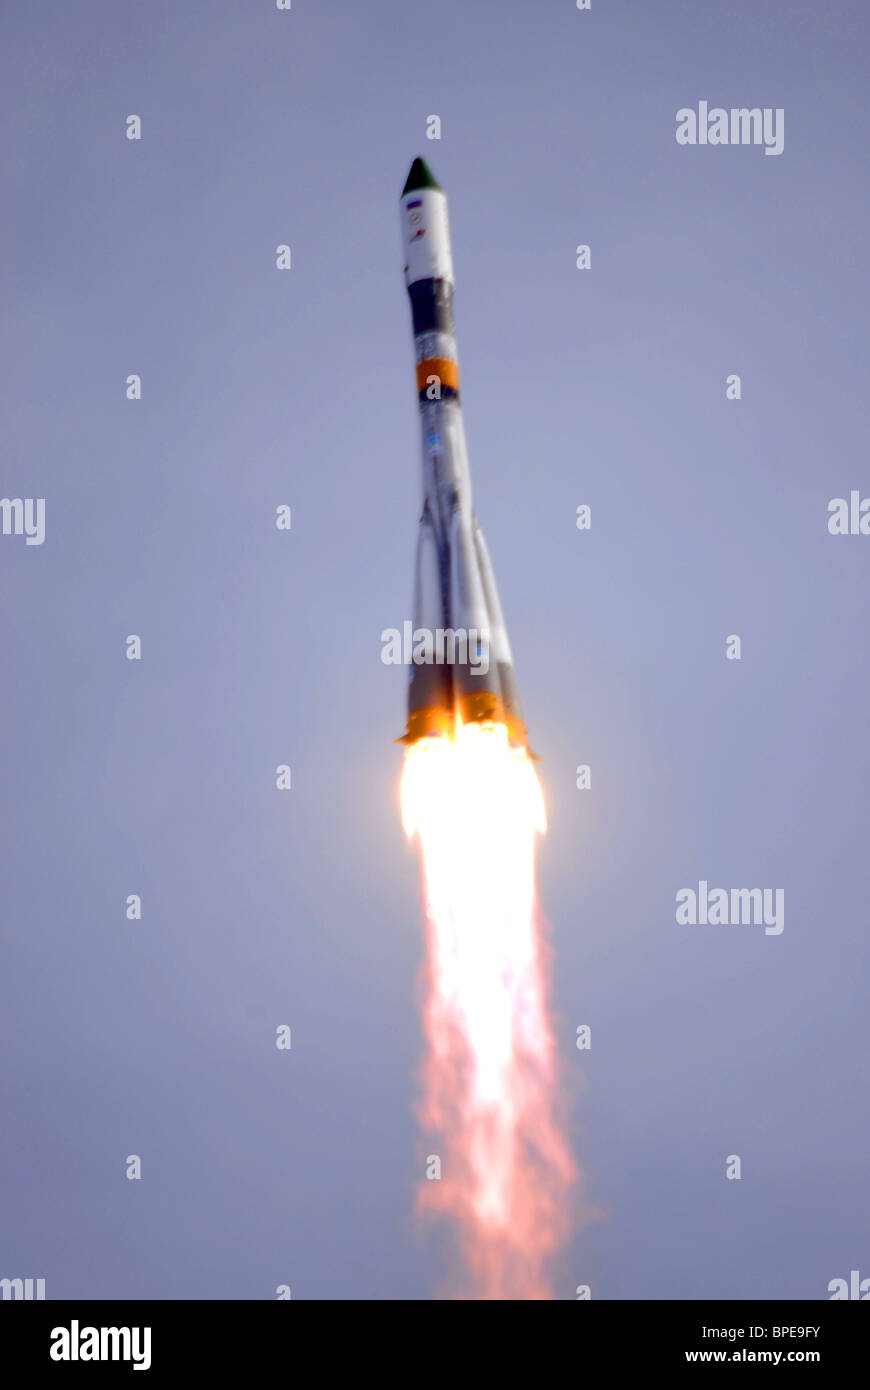 Soyuz-U booster rocket with Progress M-62 cargo spaceship blasts off from Baikonur Cosmodrome - Stock Image